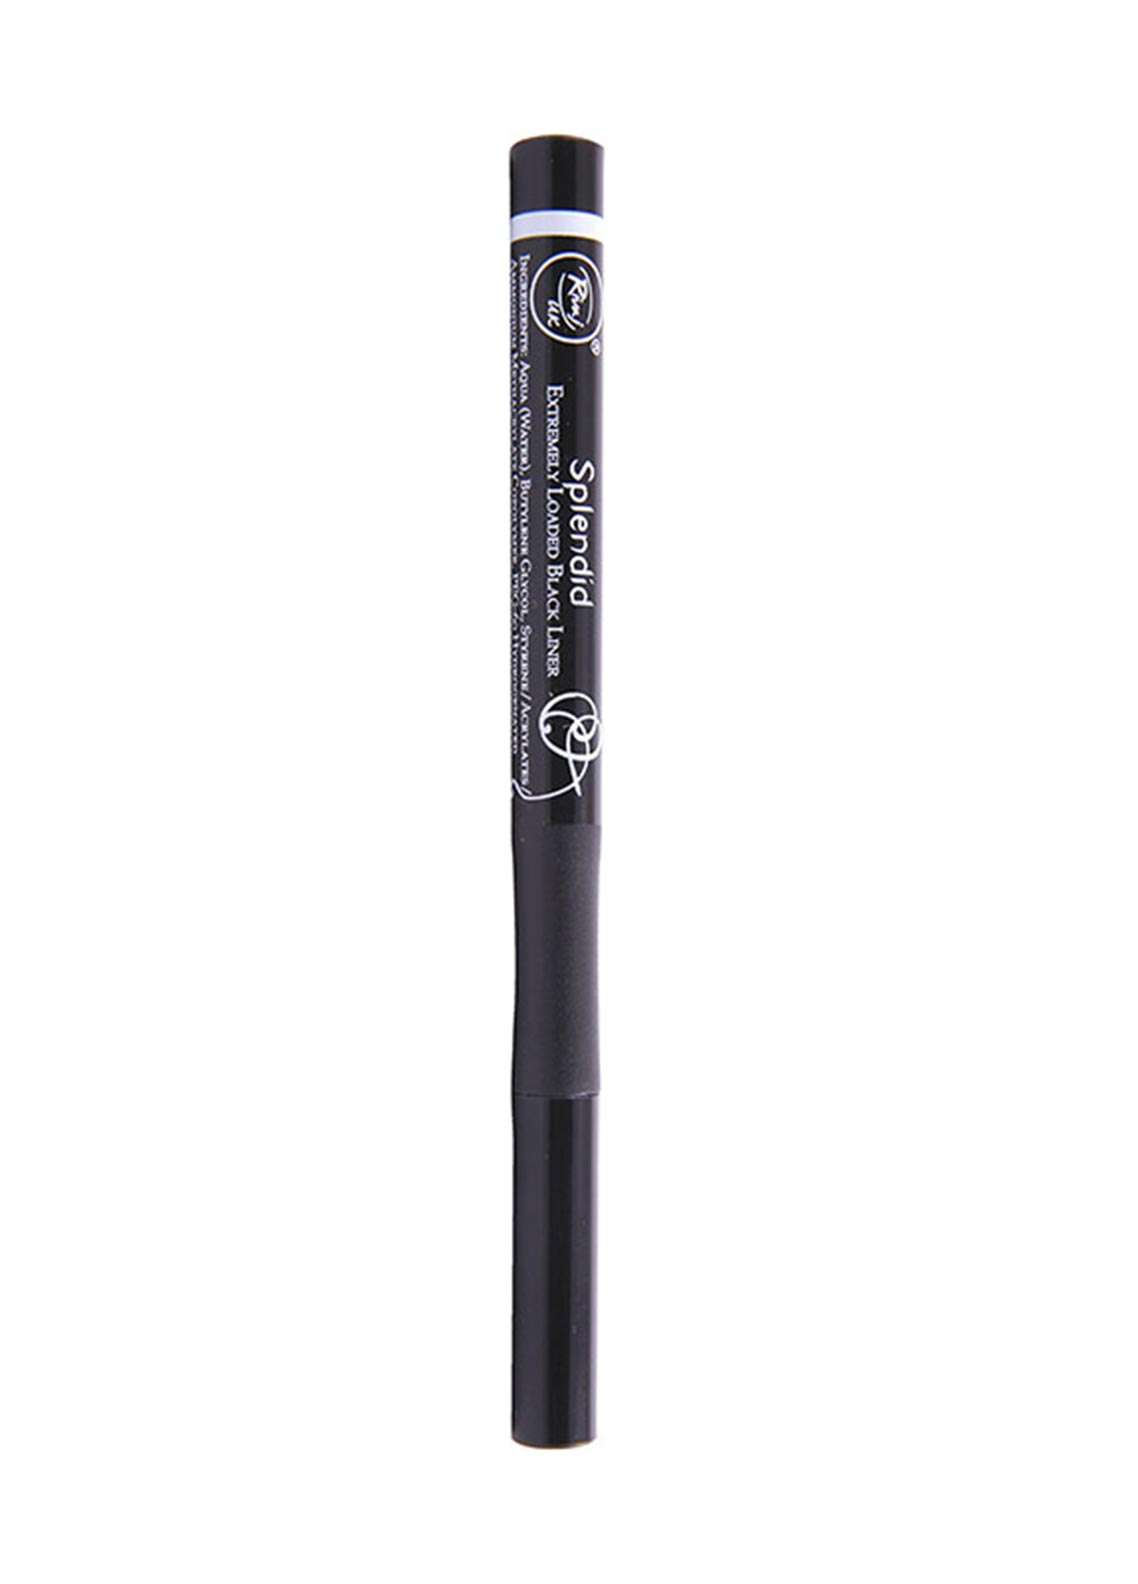 Rivaj UK Splendid Extremely Loaded Liner - 1 ml - Black